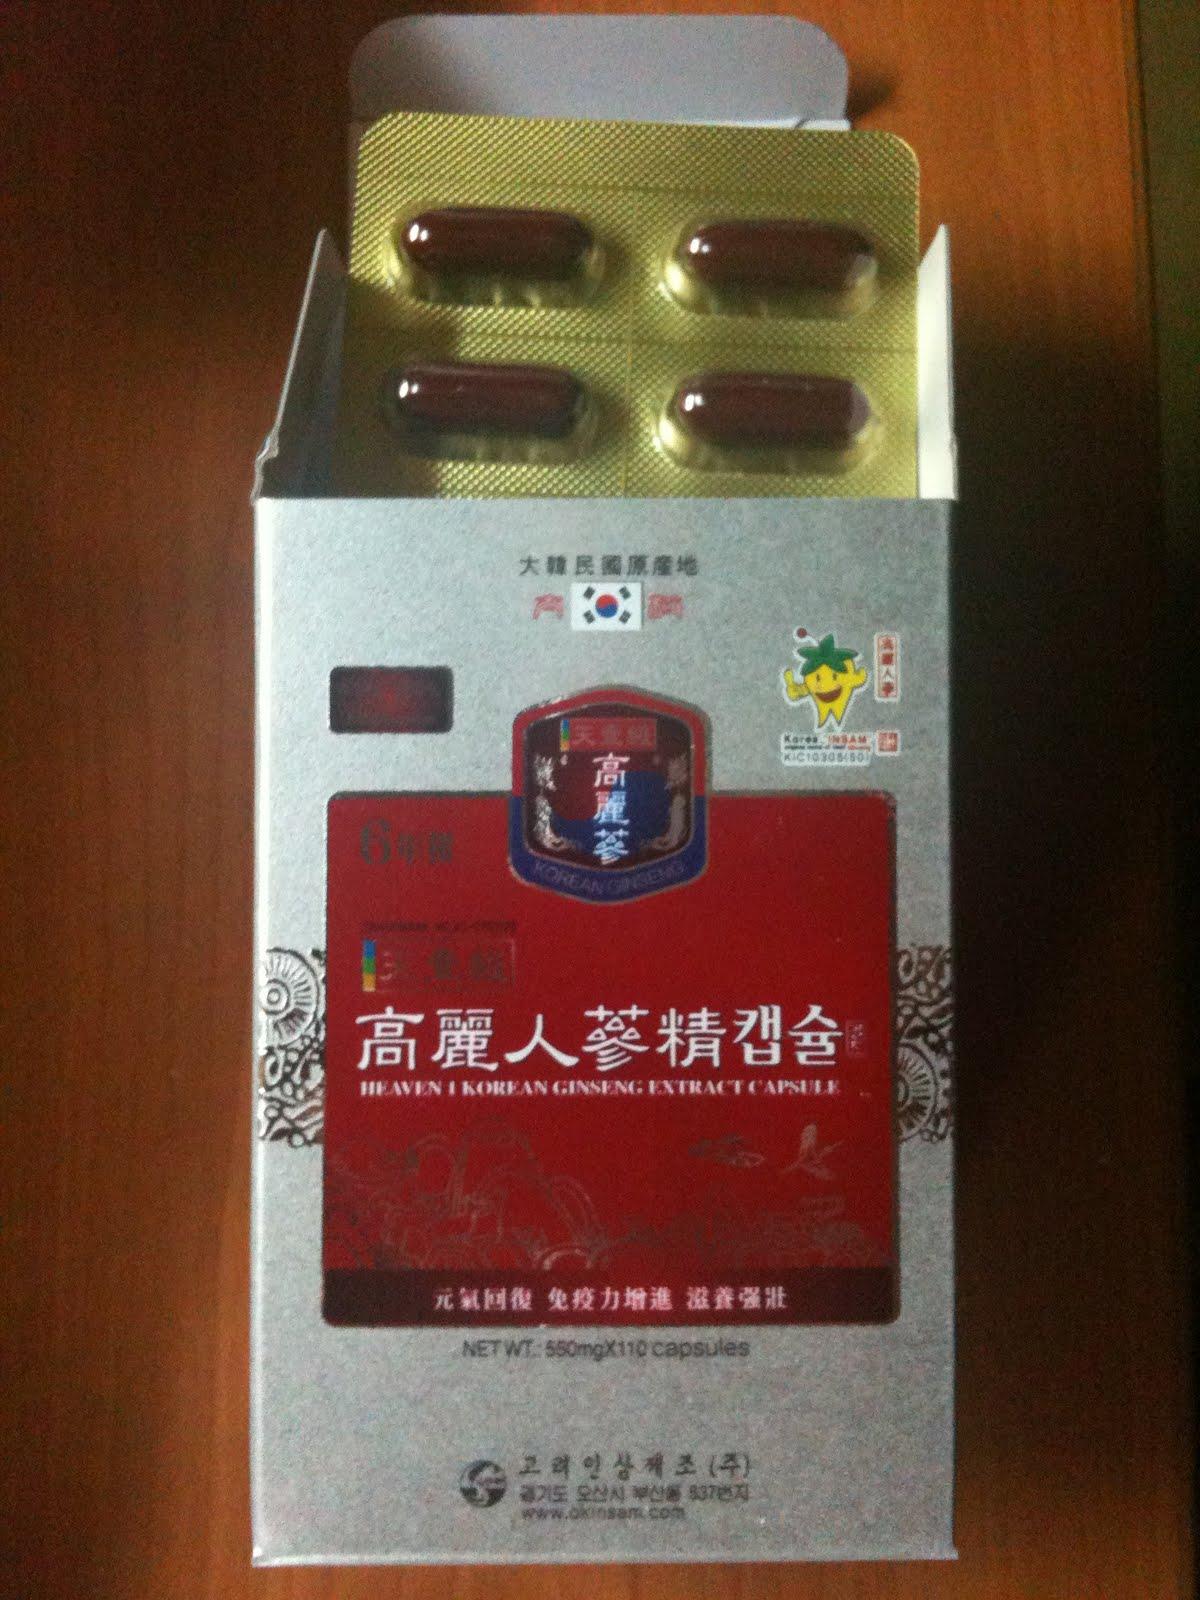 korean ginseng extract capsule